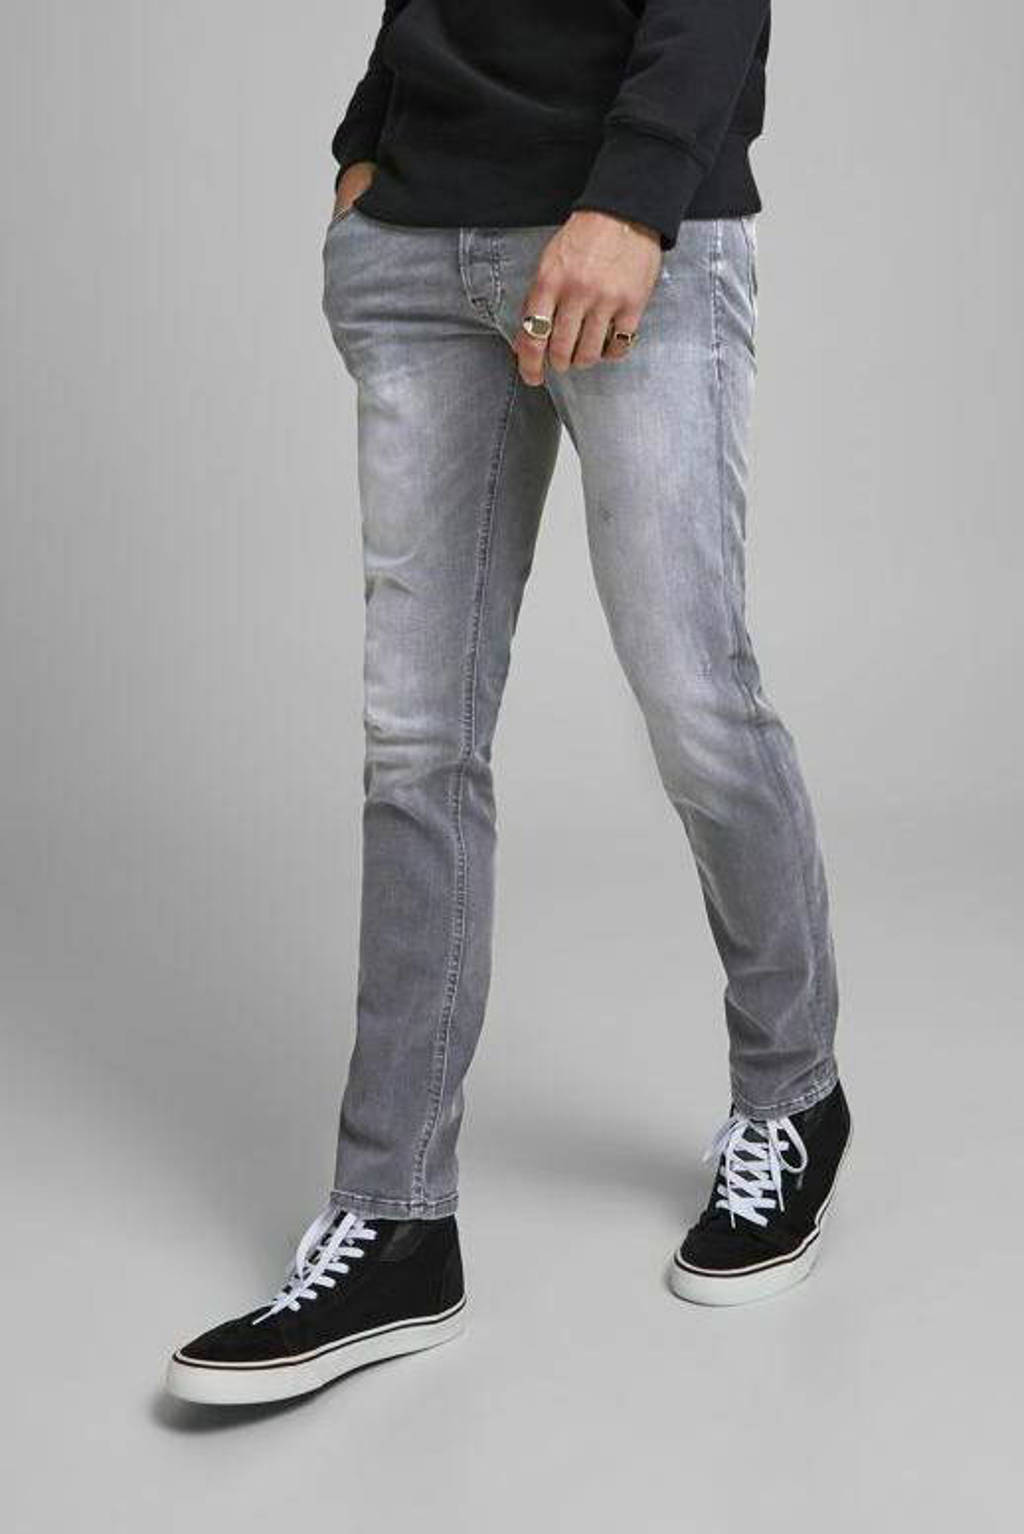 JACK & JONES JEANS INTELLIGENCE slim fit jeans Glenn grey denim, Grey denim